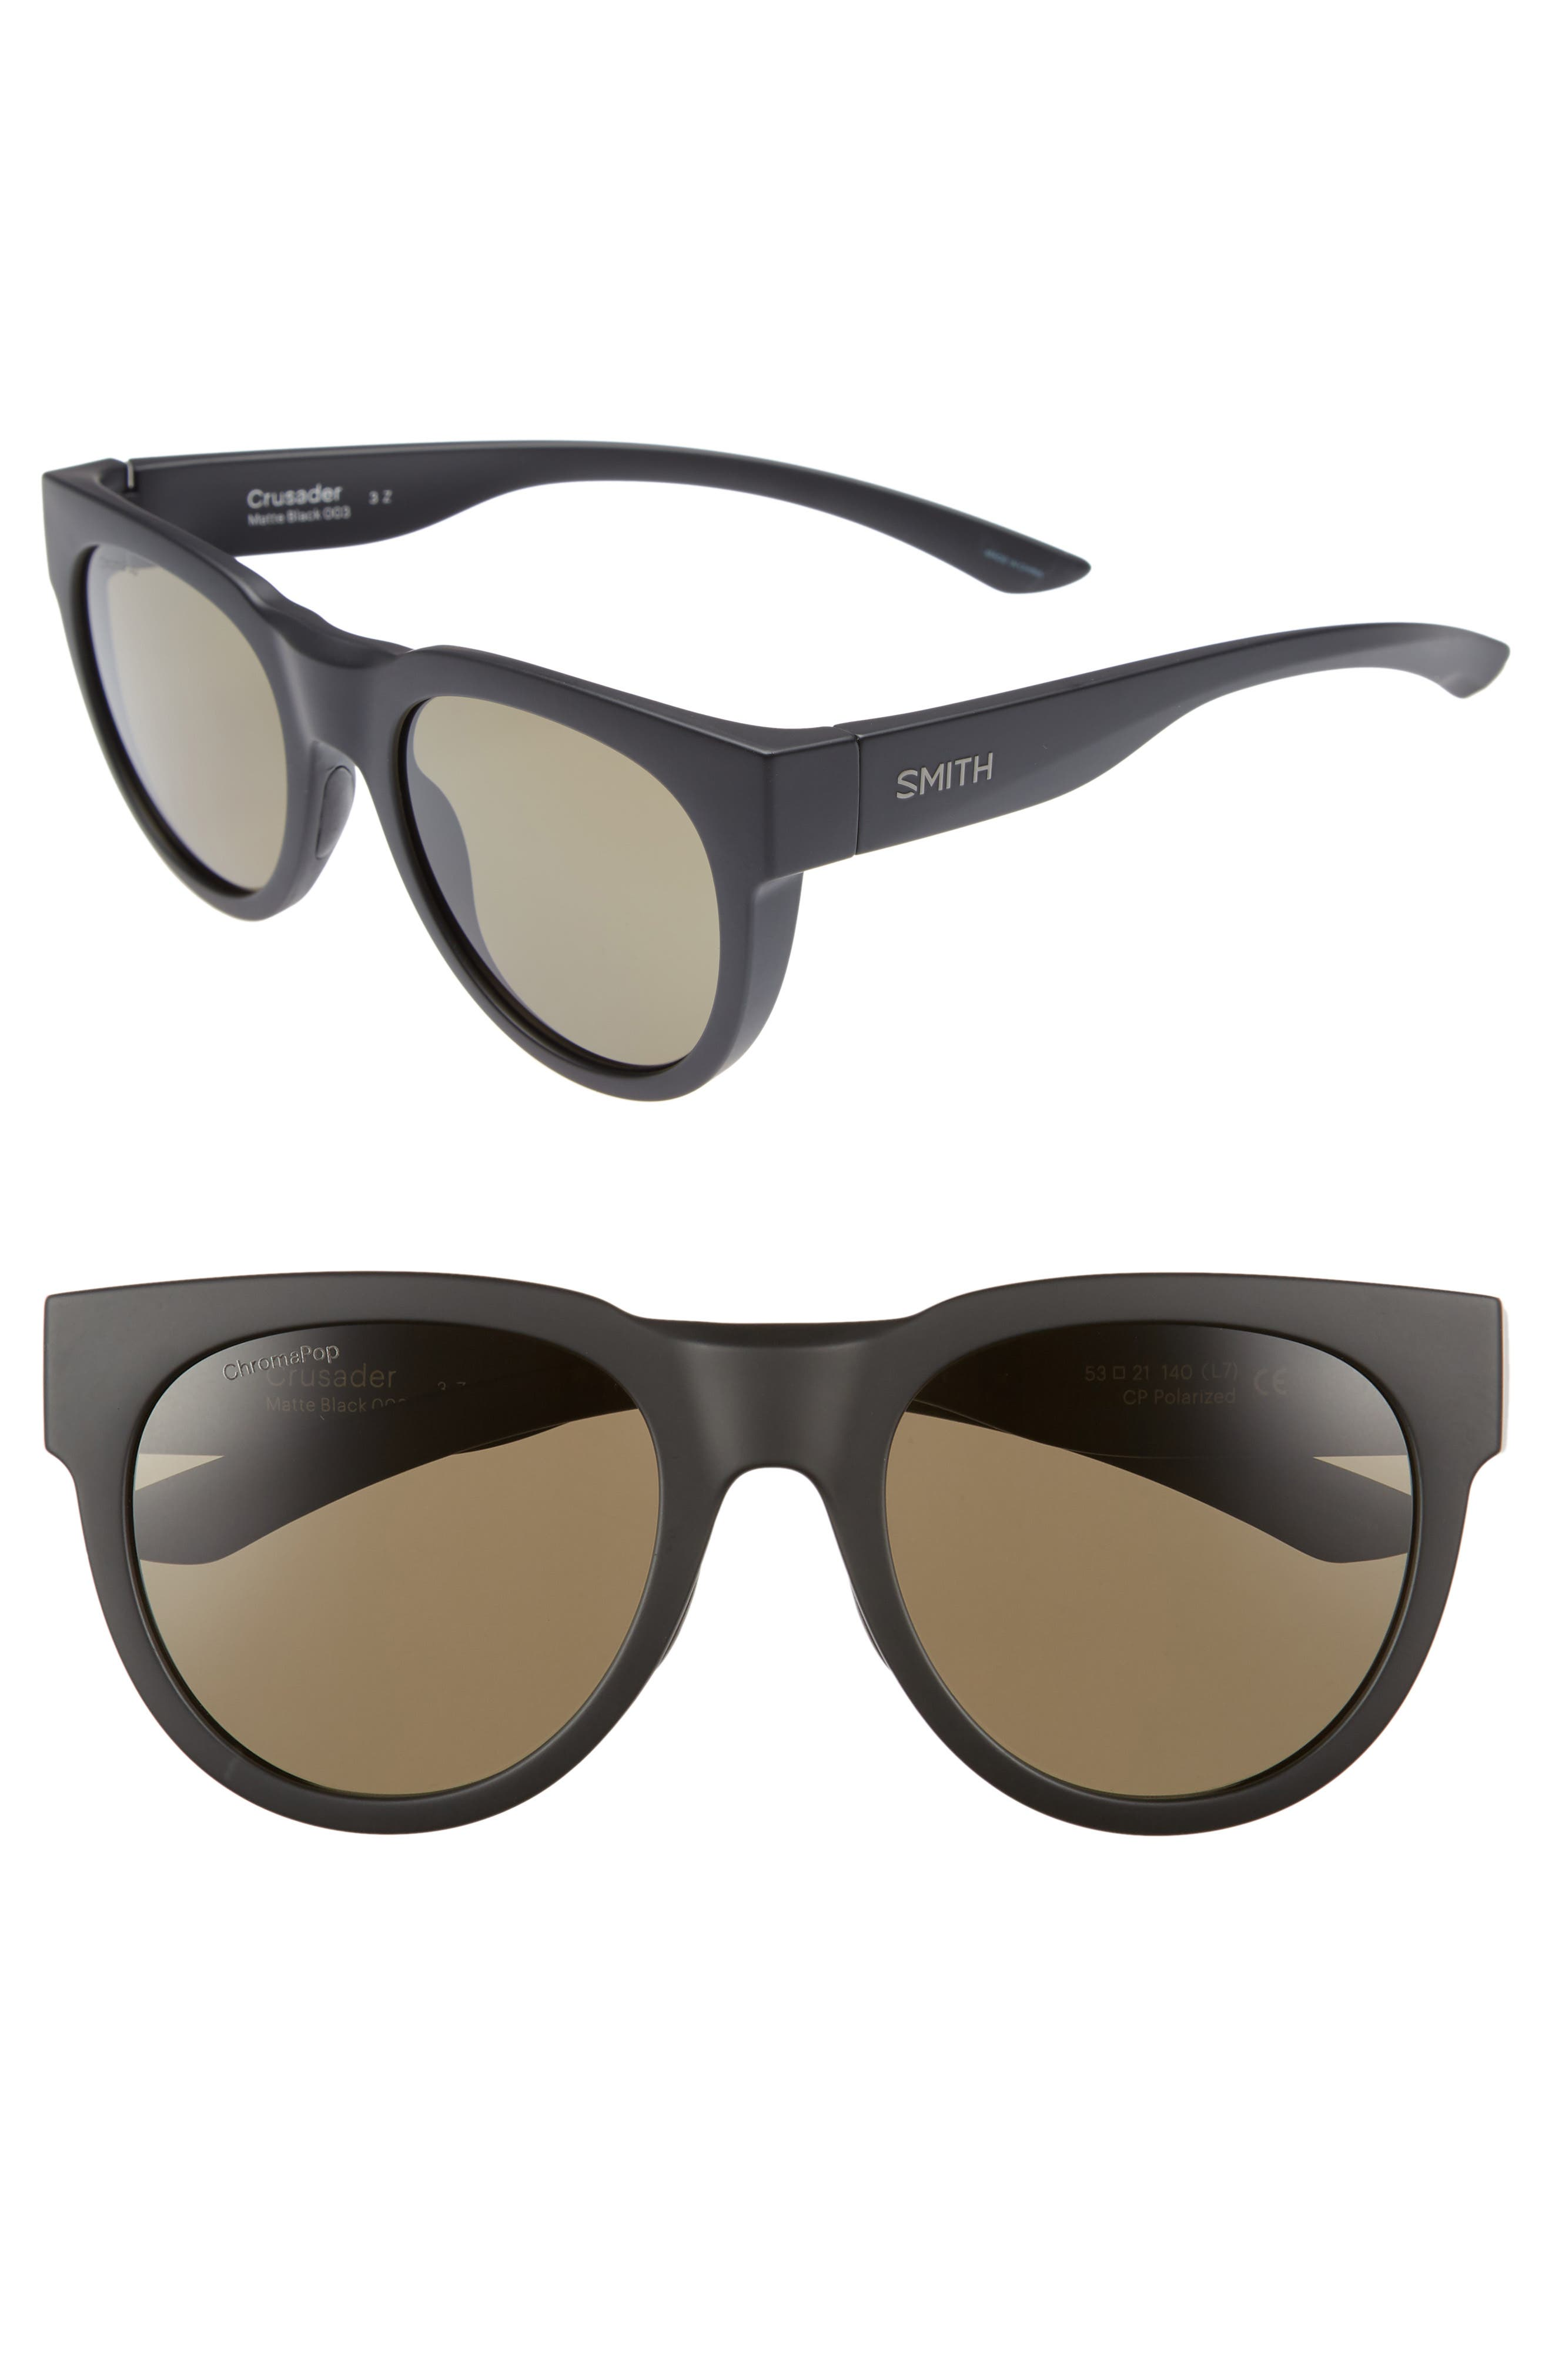 Crusader 53mm ChromaPop<sup>™</sup> Round Sunglasses,                         Main,                         color, MATTE BLACK